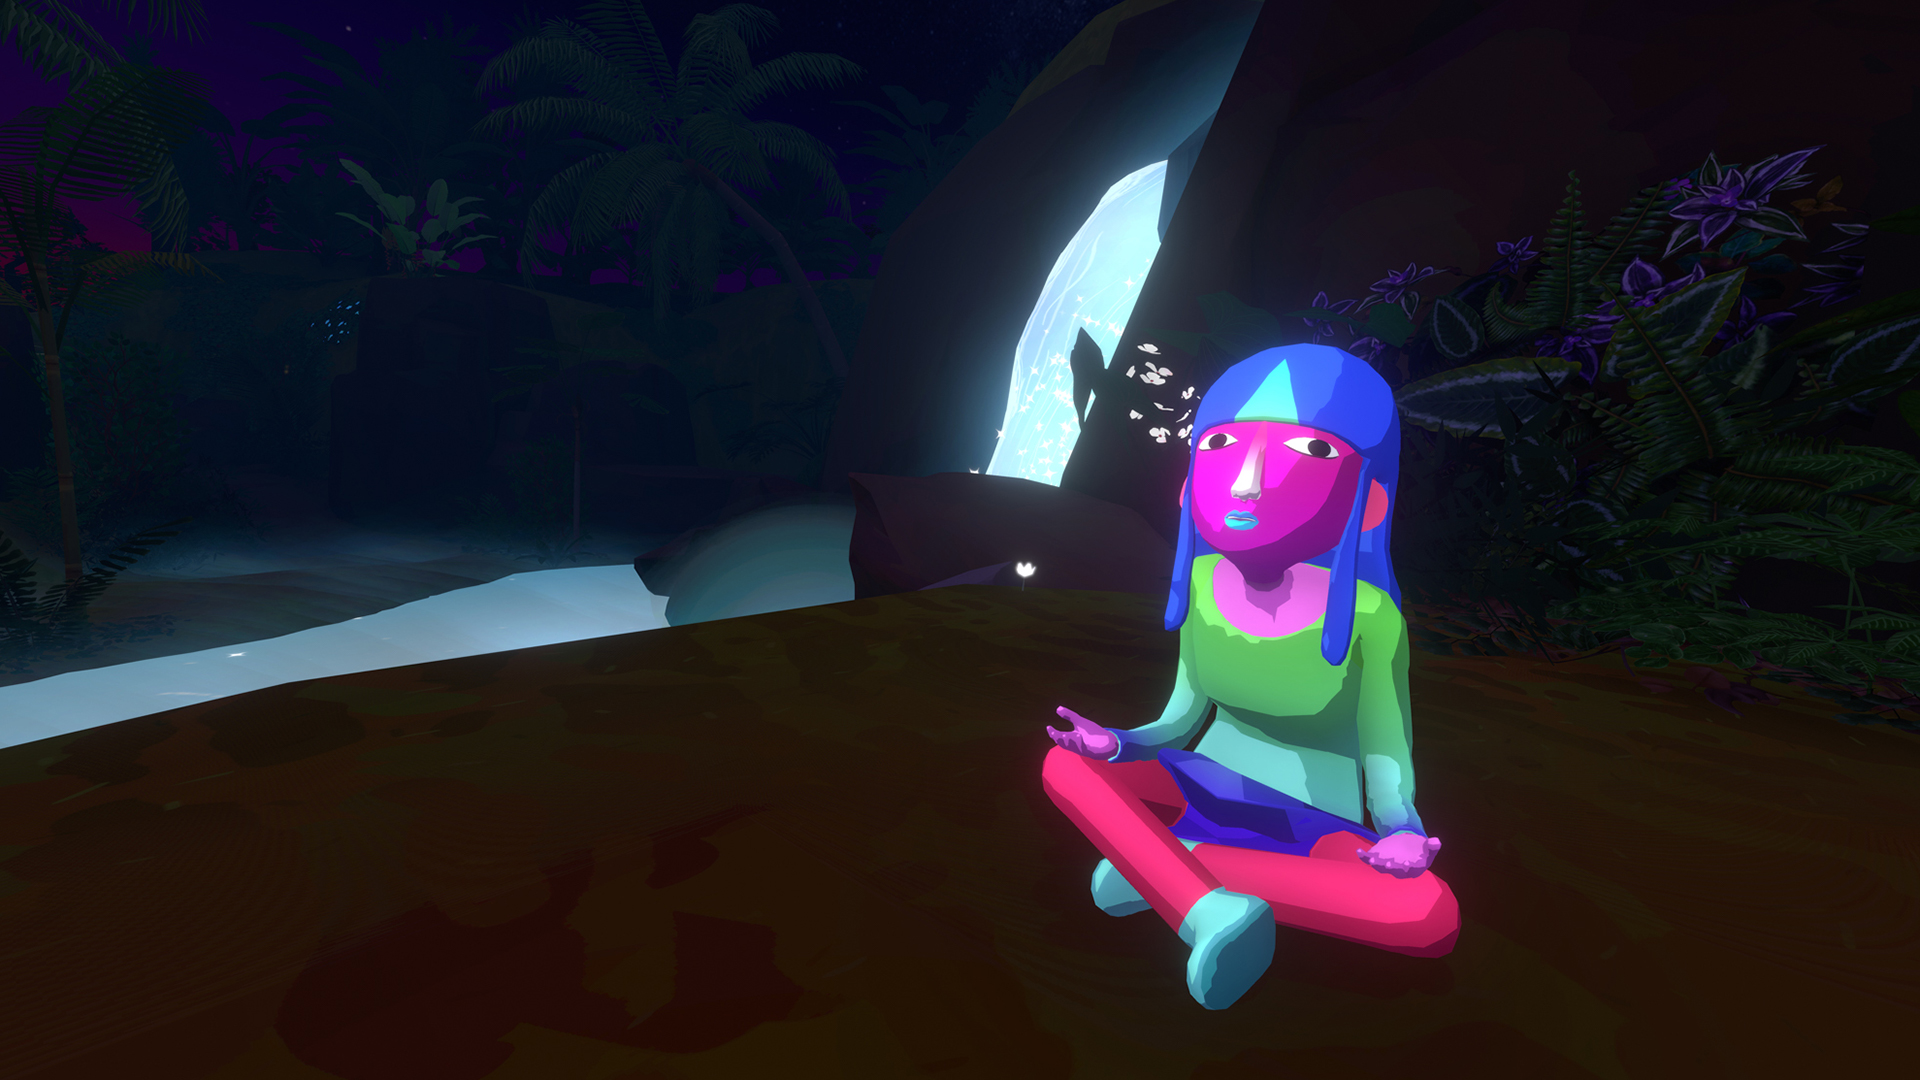 Floresta Encantada - Realidade Virtual por VJ Suave